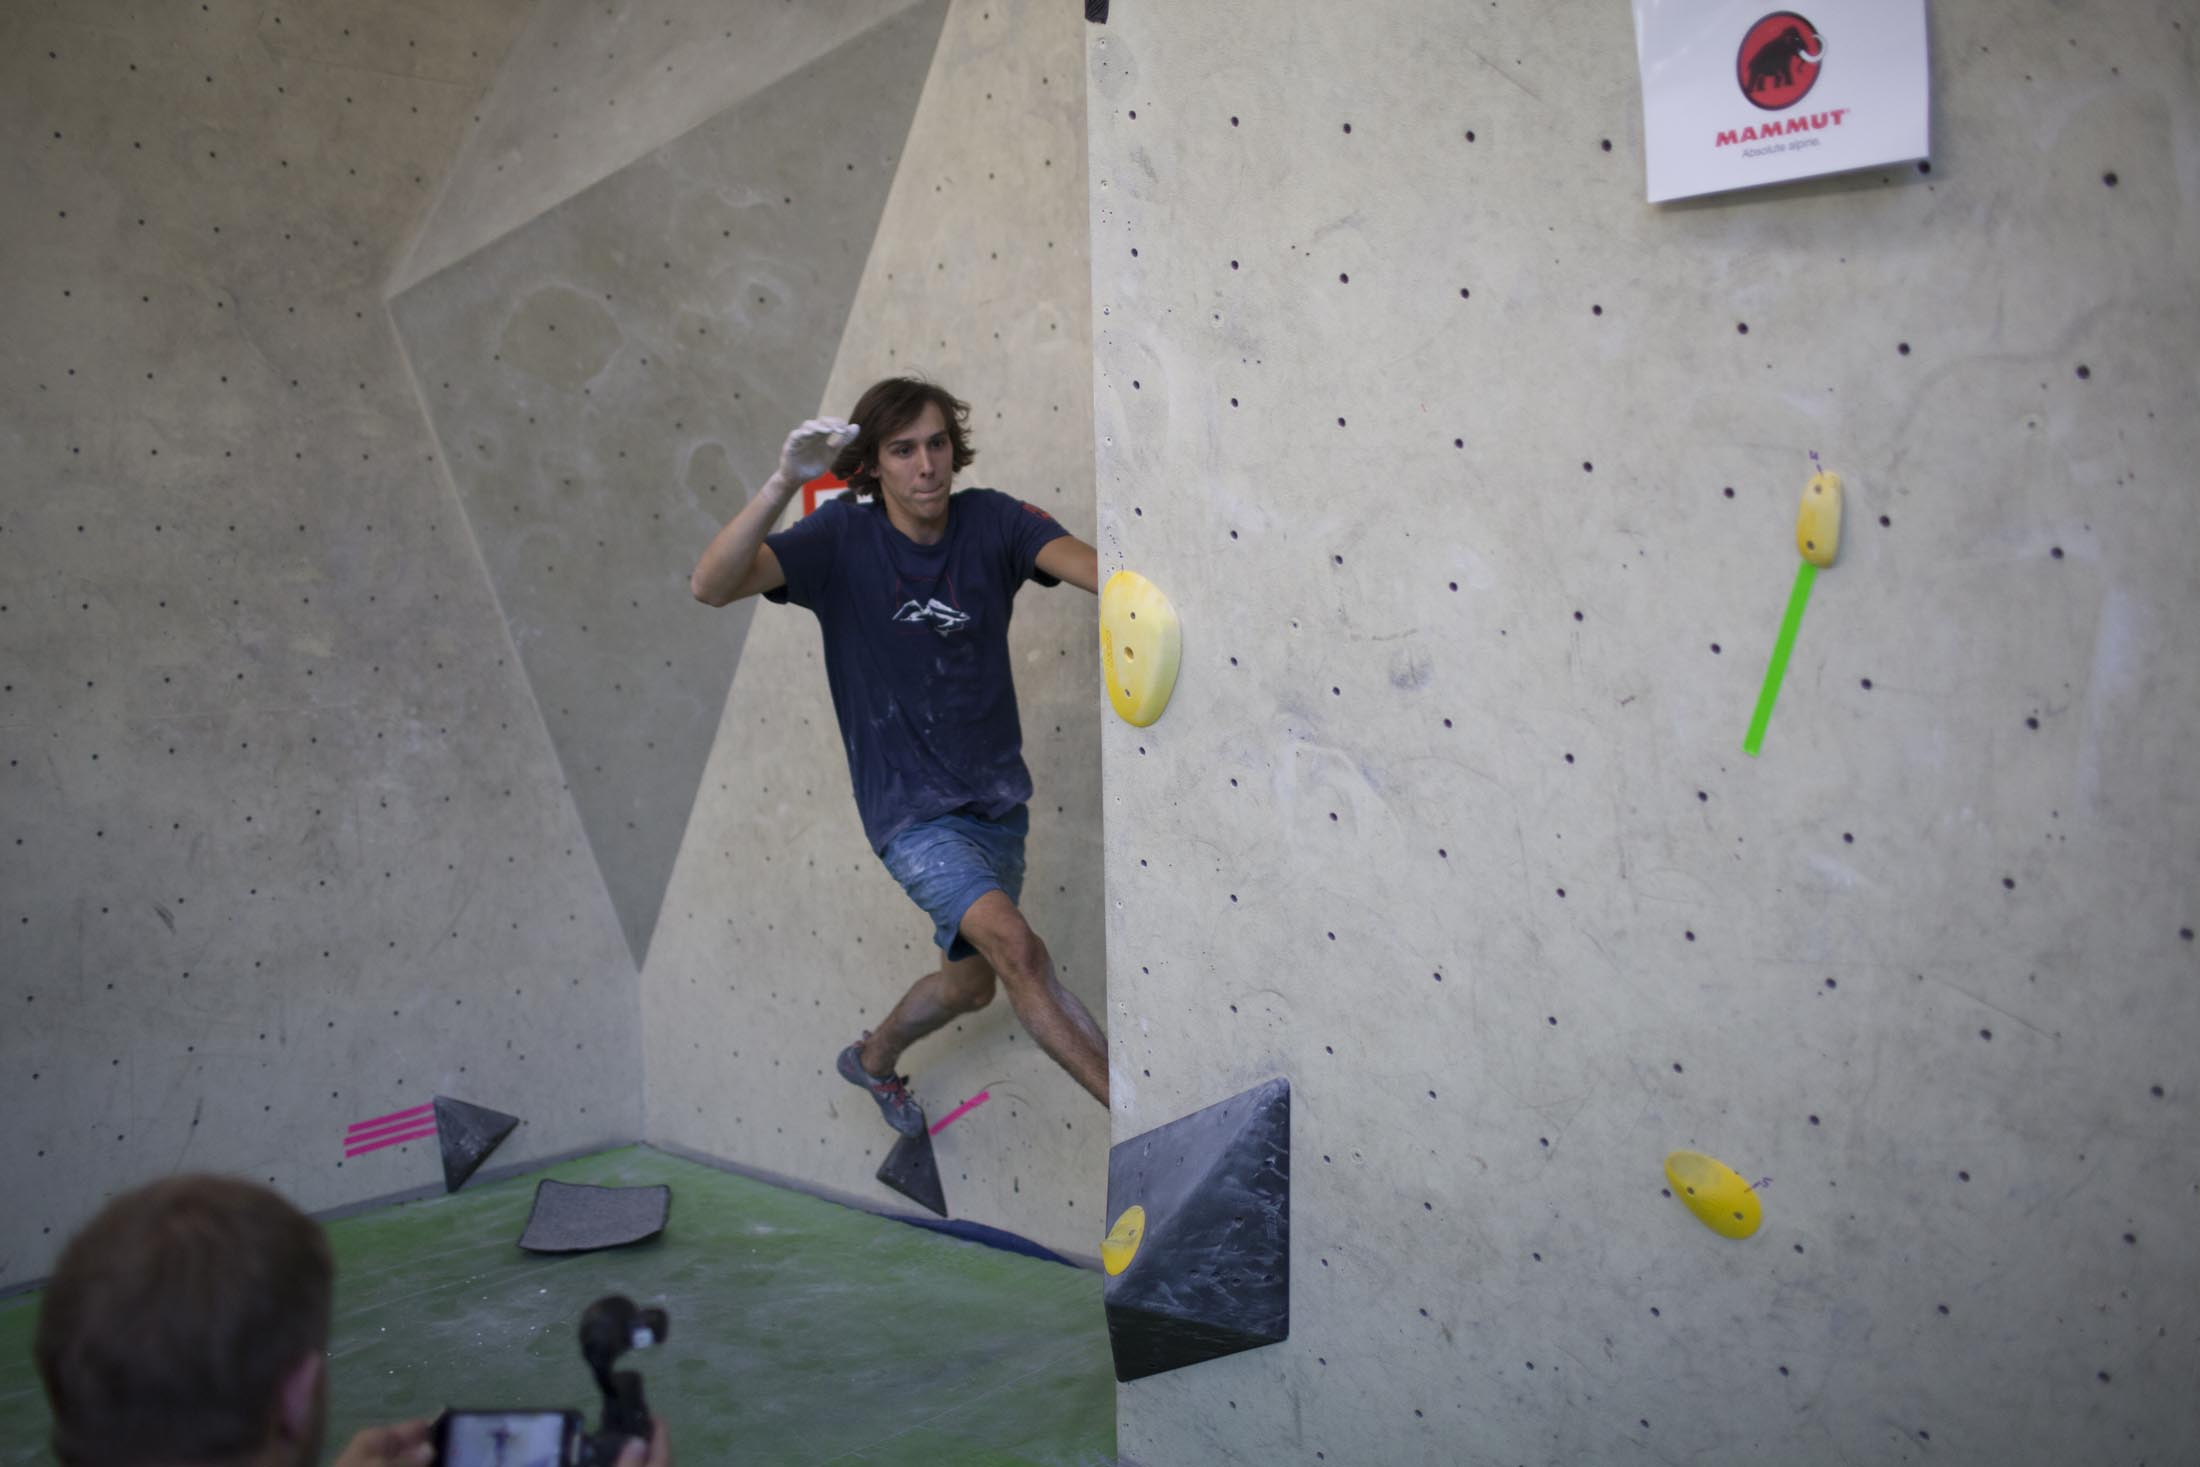 Finale, internationaler bouldercup Frankenjura 2016, BLOCKHELDEN Erlangen, Mammut, Bergfreunde.de, Boulderwettkampf07092016488